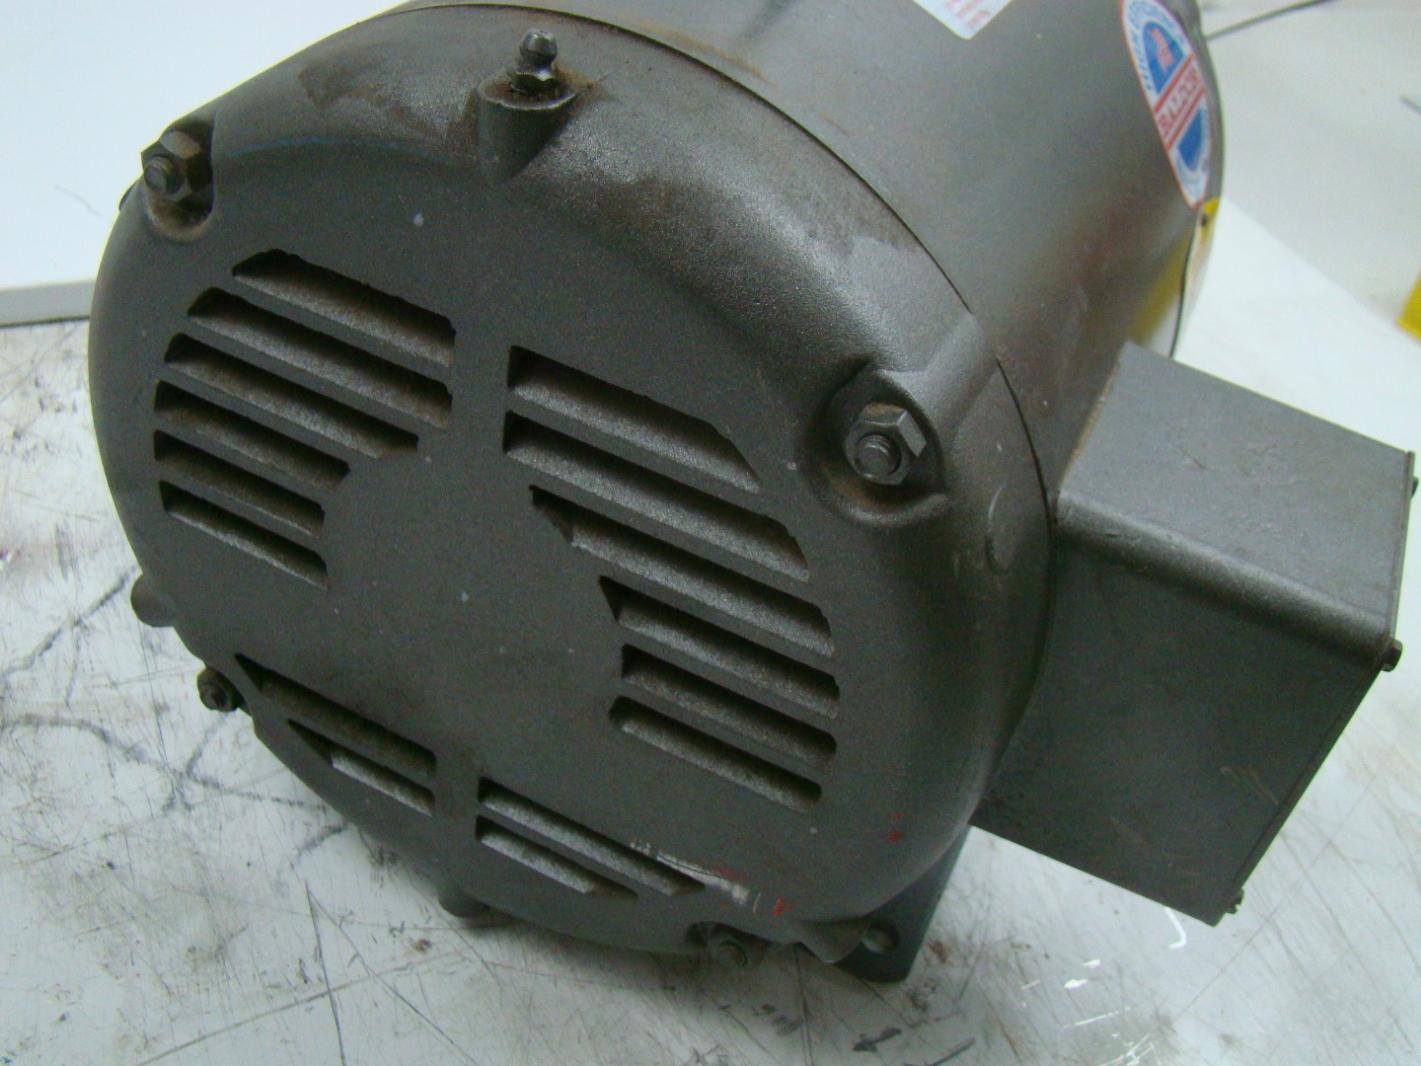 Baldor 5 Hp Electric Motor 208 230 460v 1725 Rpm M3308